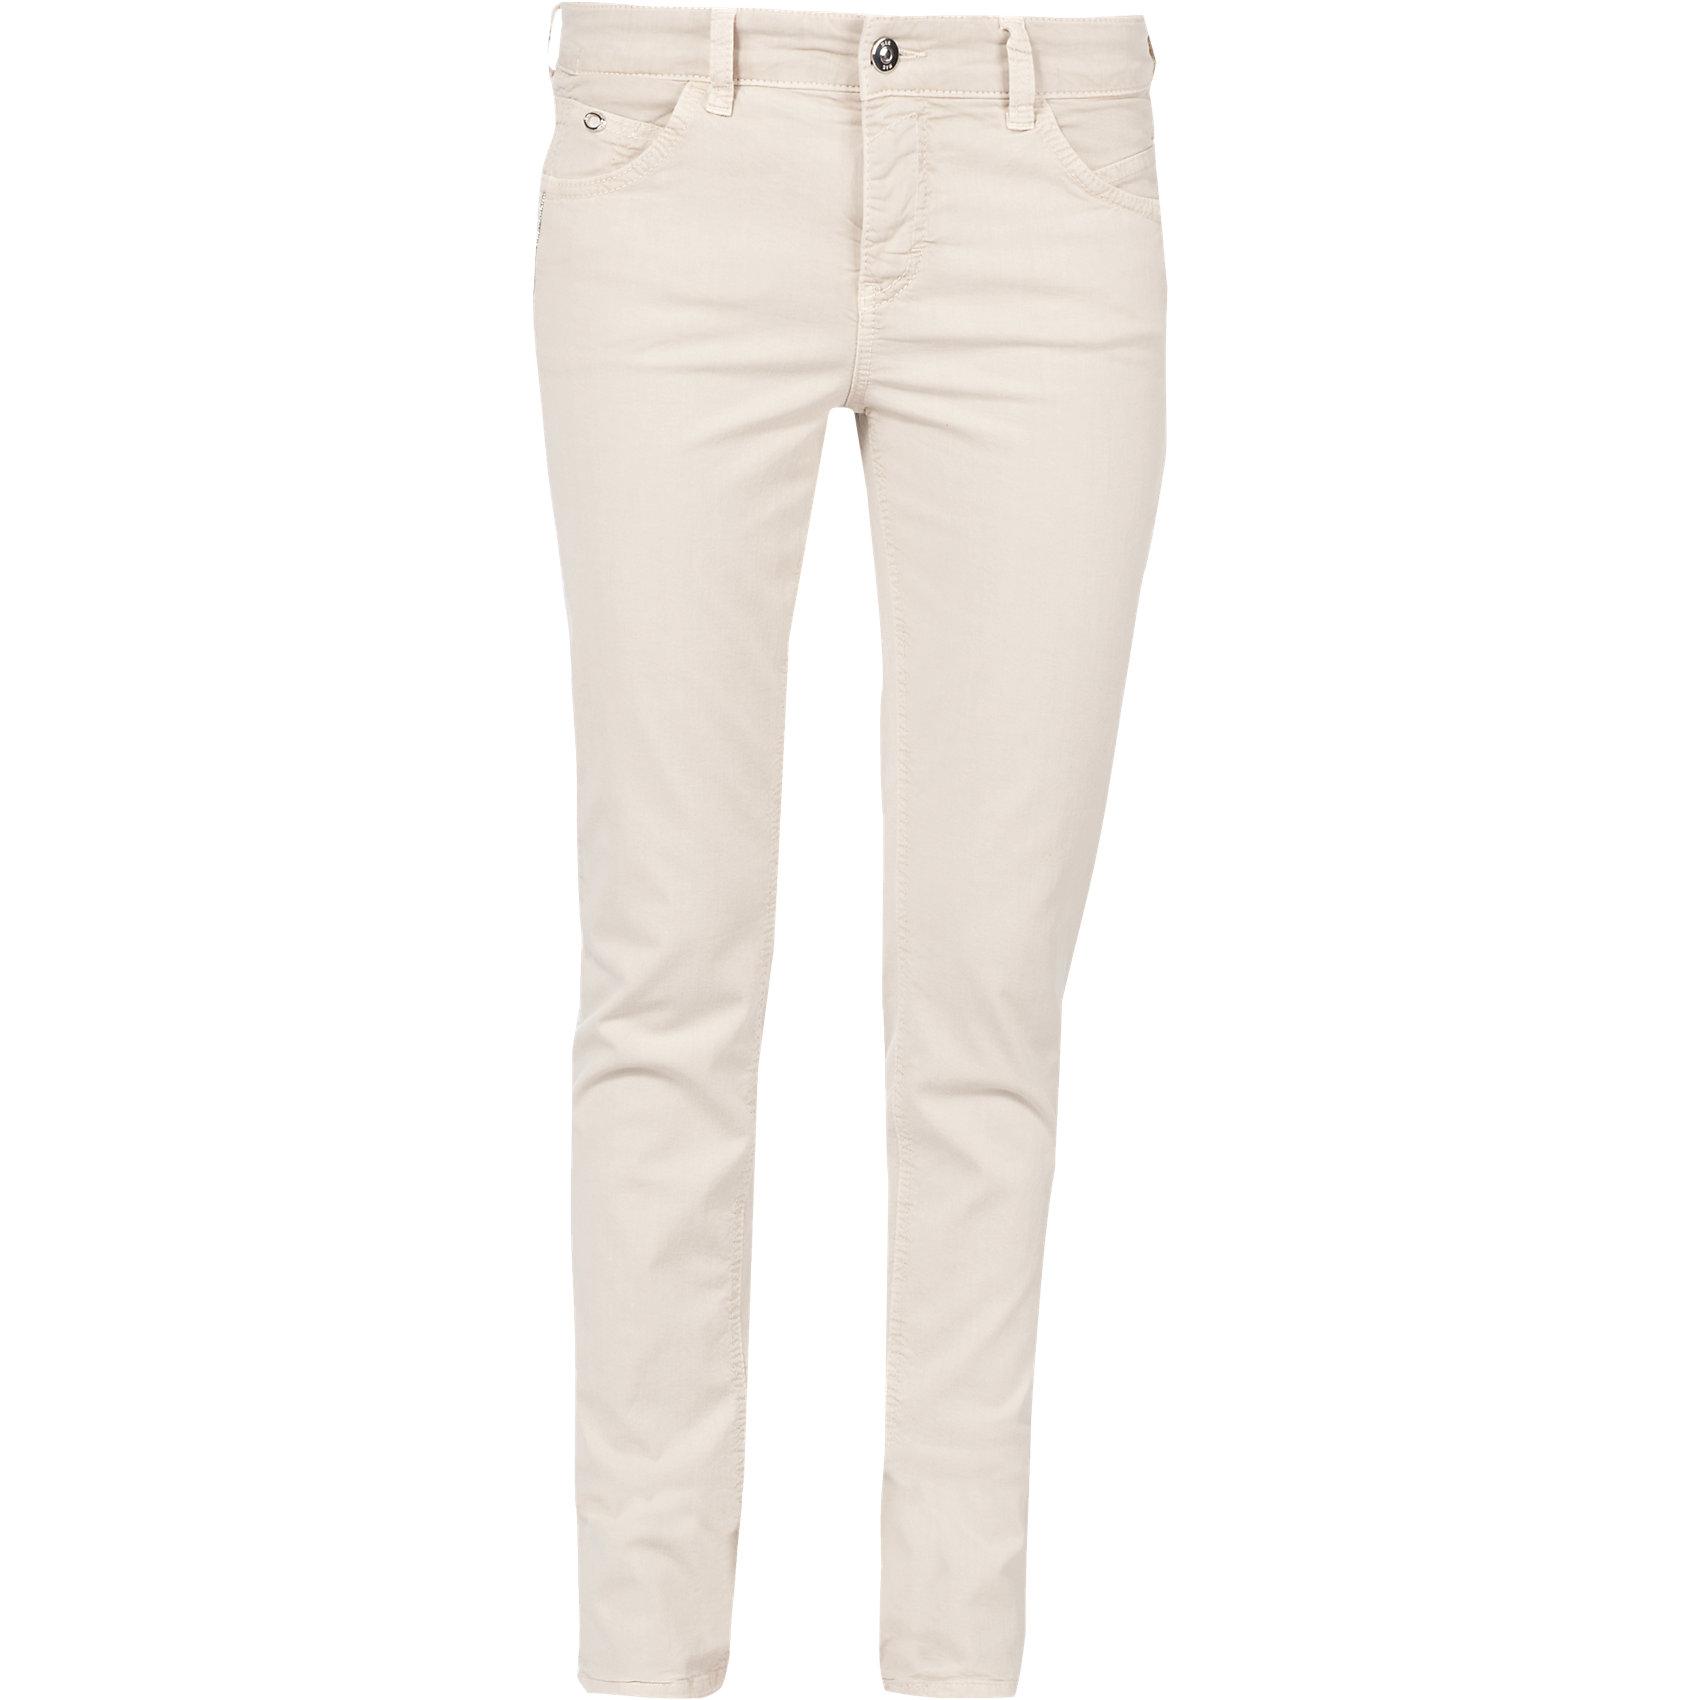 neu mac jeans angela pipe dynamic slim elfenbein 6026119. Black Bedroom Furniture Sets. Home Design Ideas